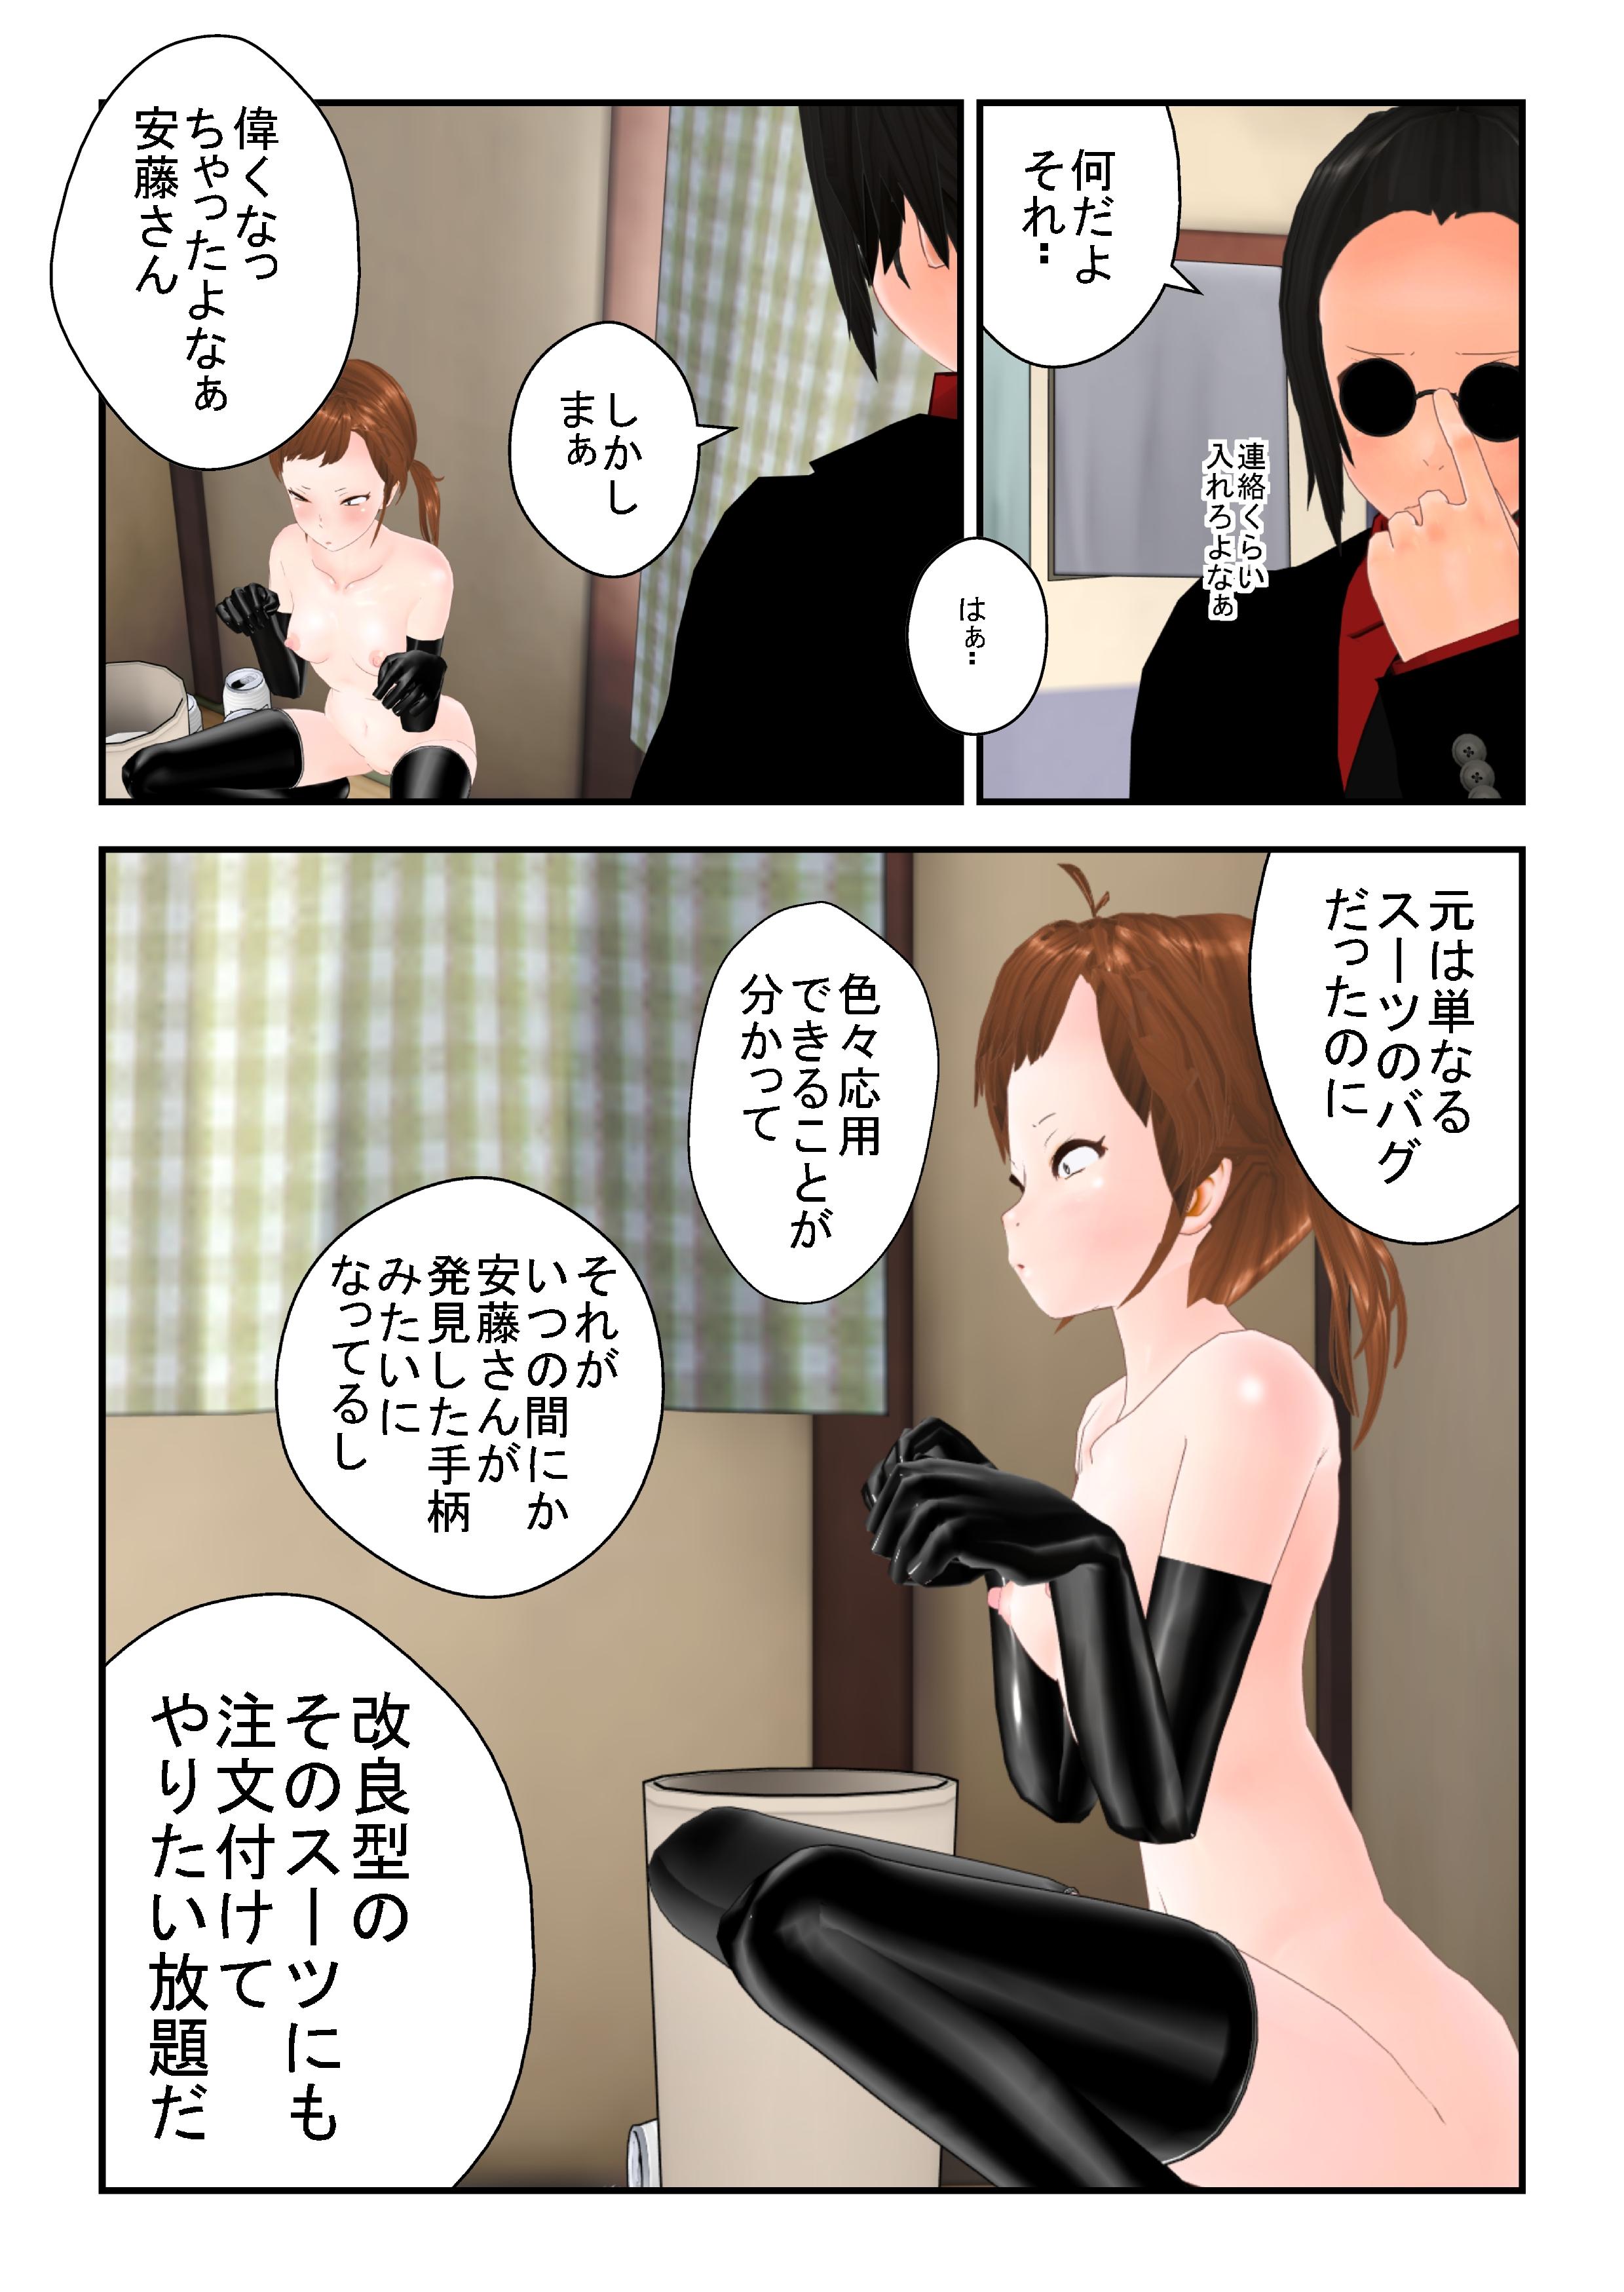 shi_0039.jpg